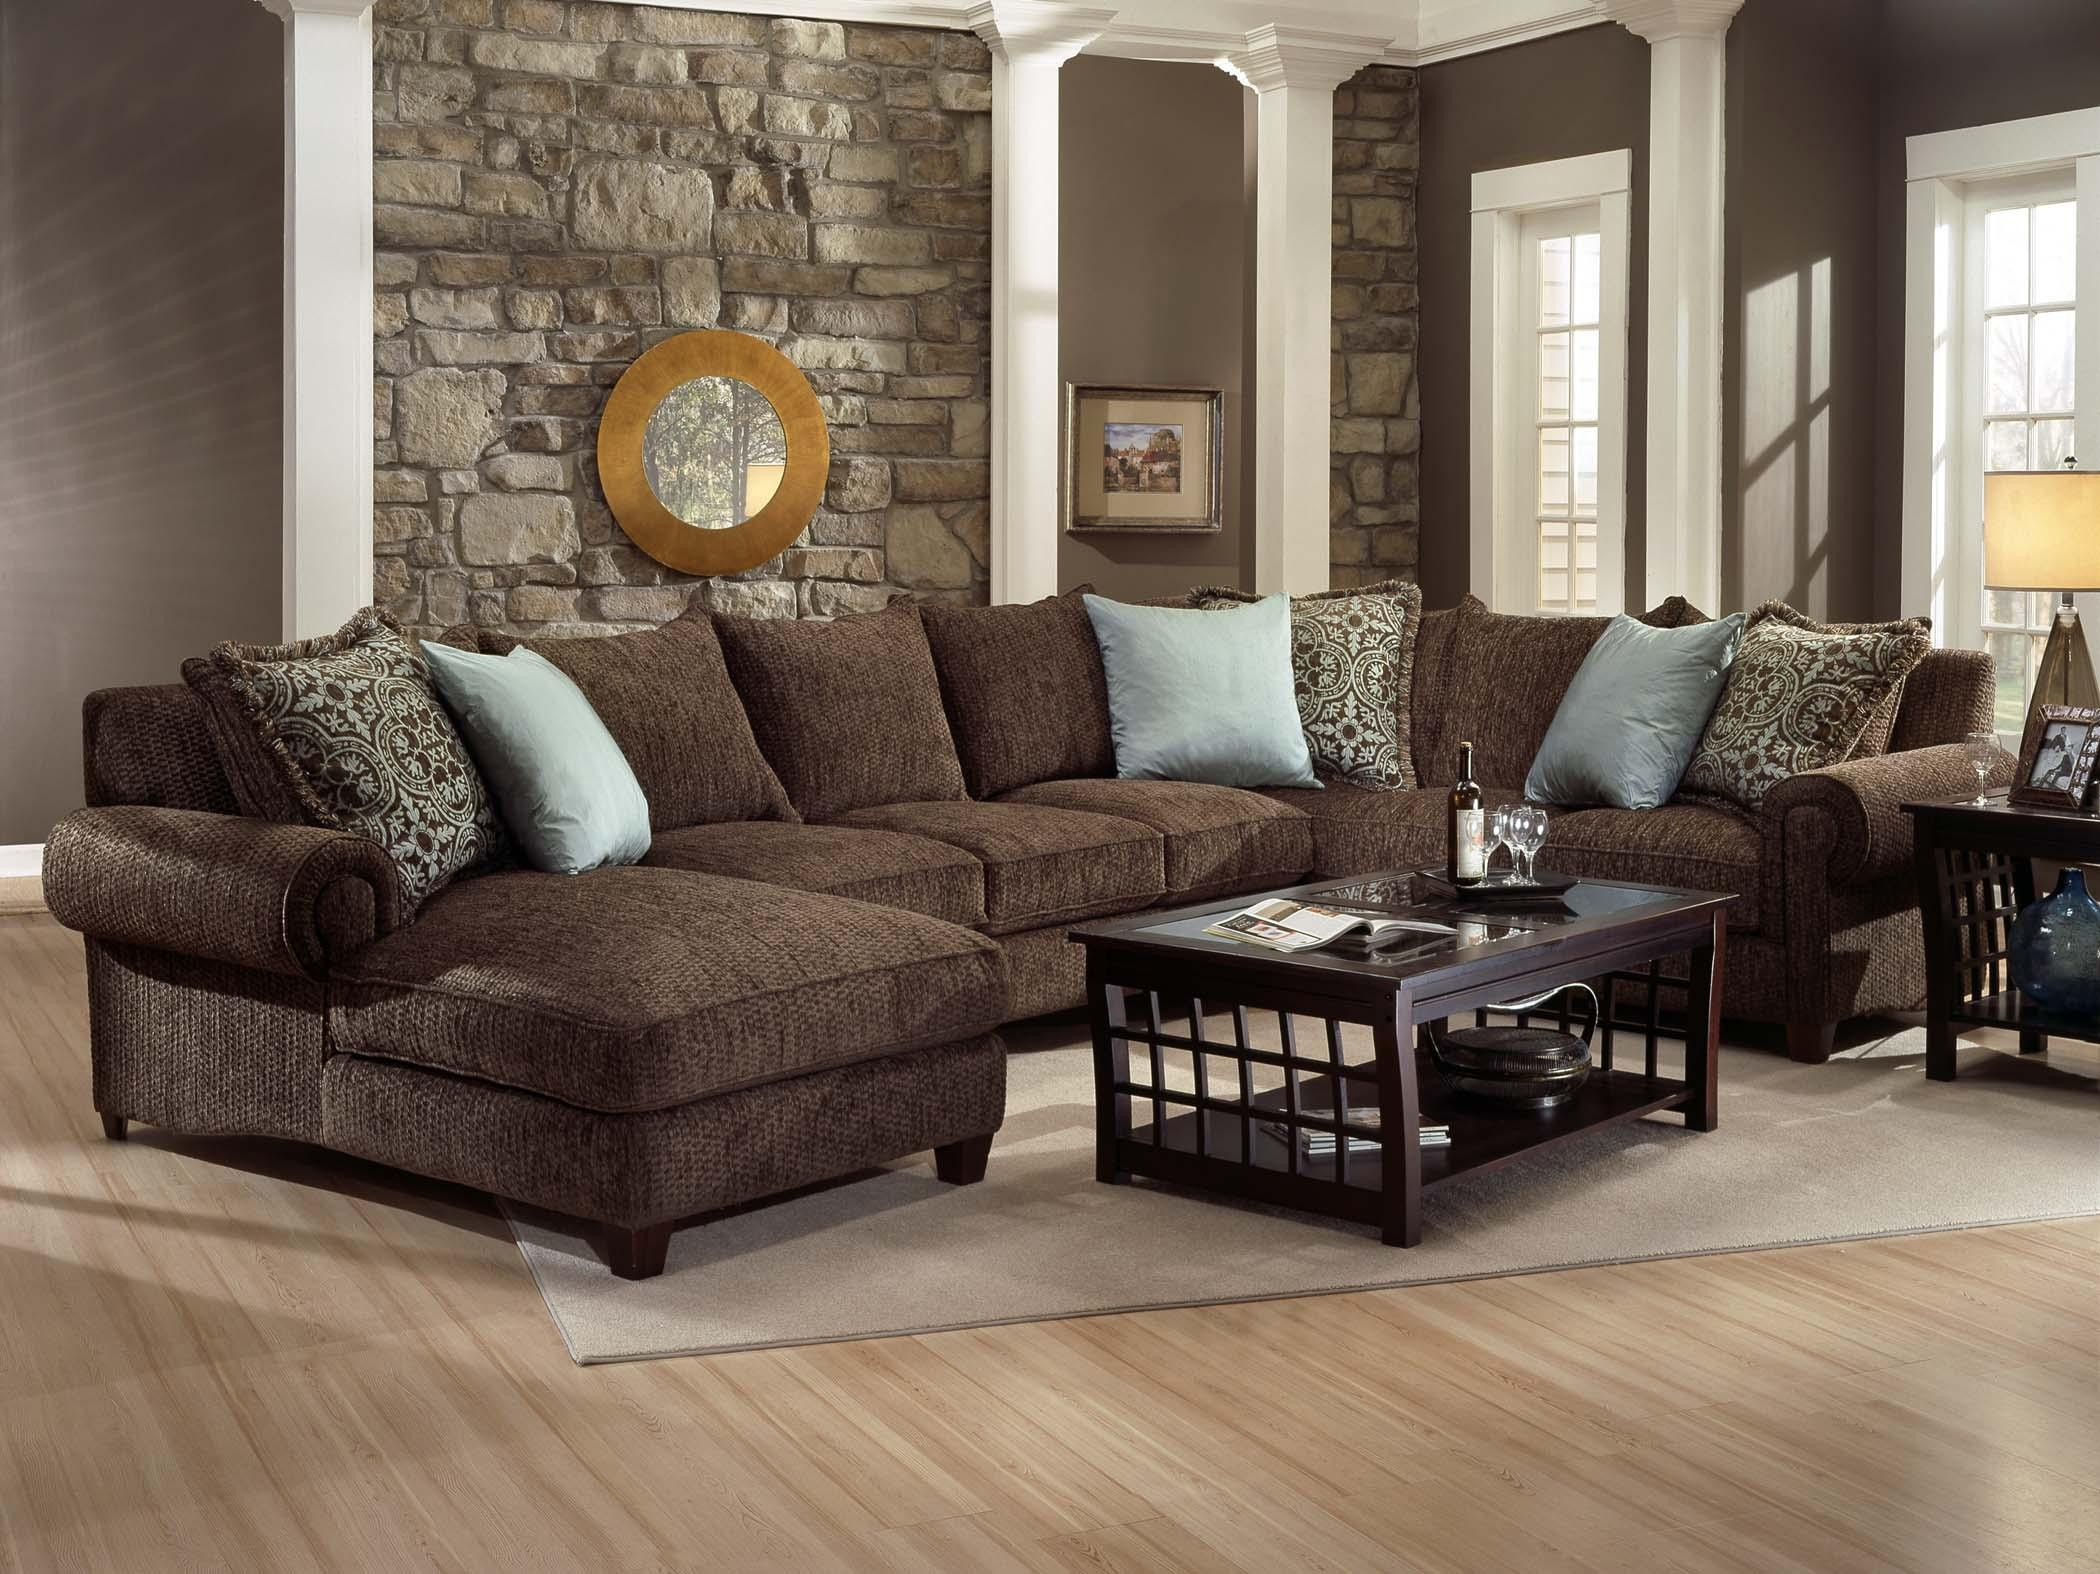 cupboard marketplace dawkins home cj robert furniture dellatore news michael